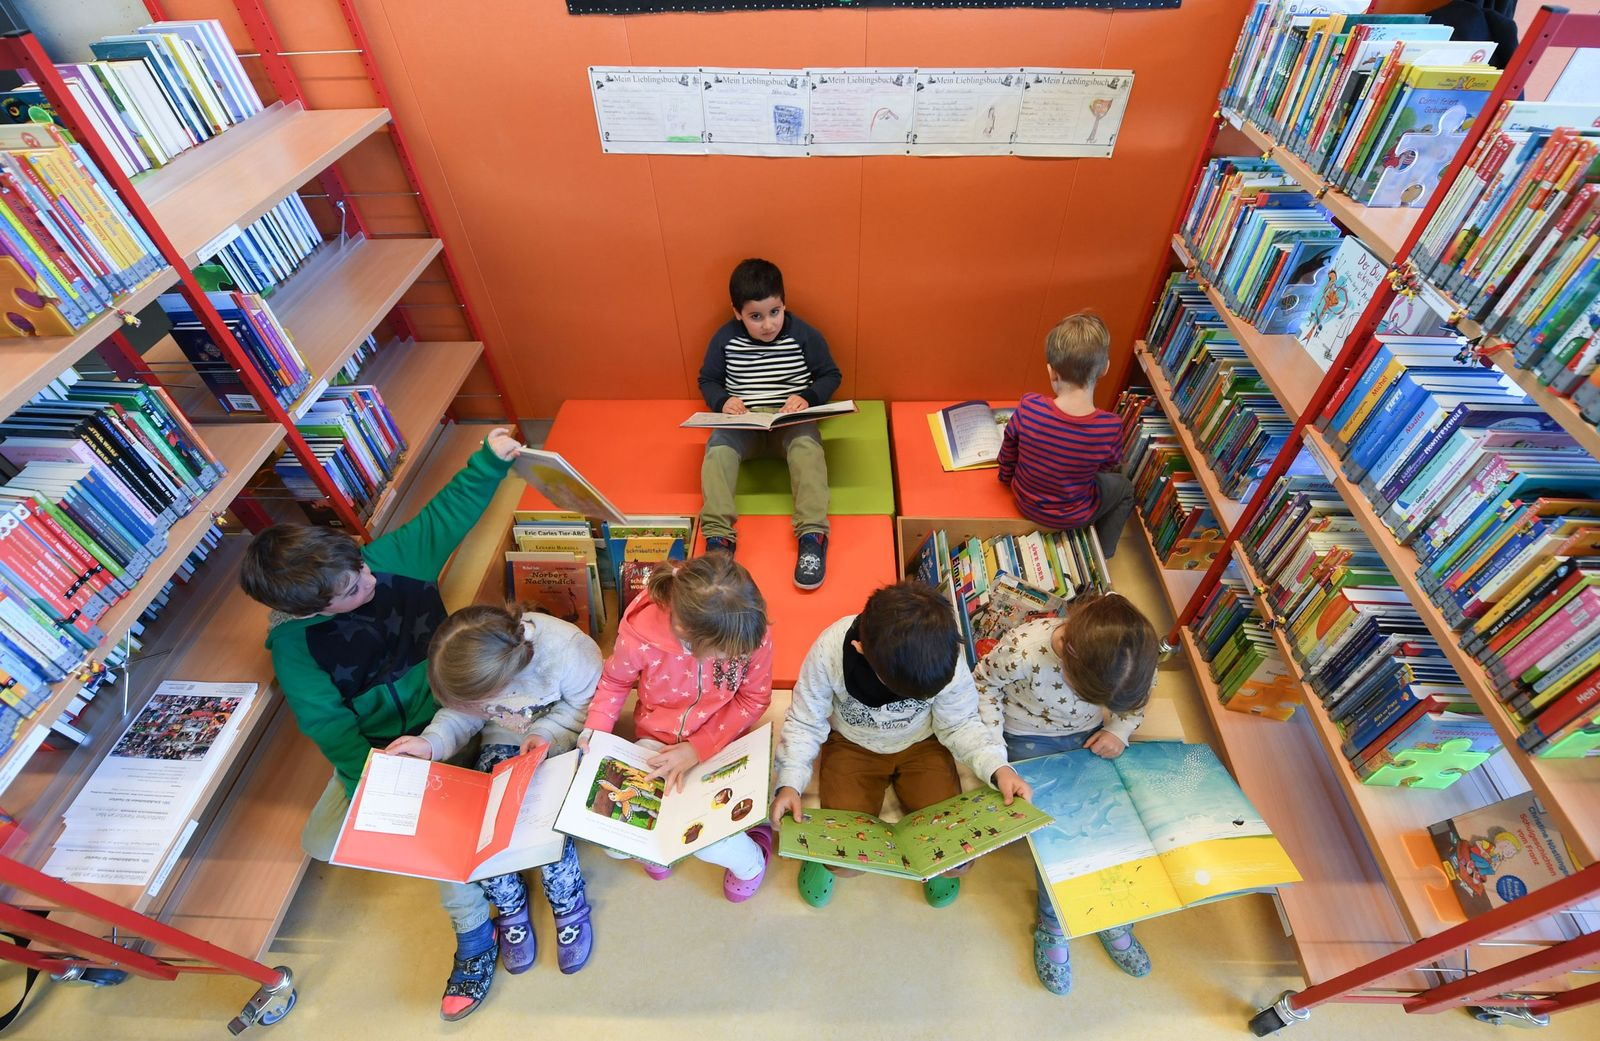 Schulbibliothek in Frankfurt